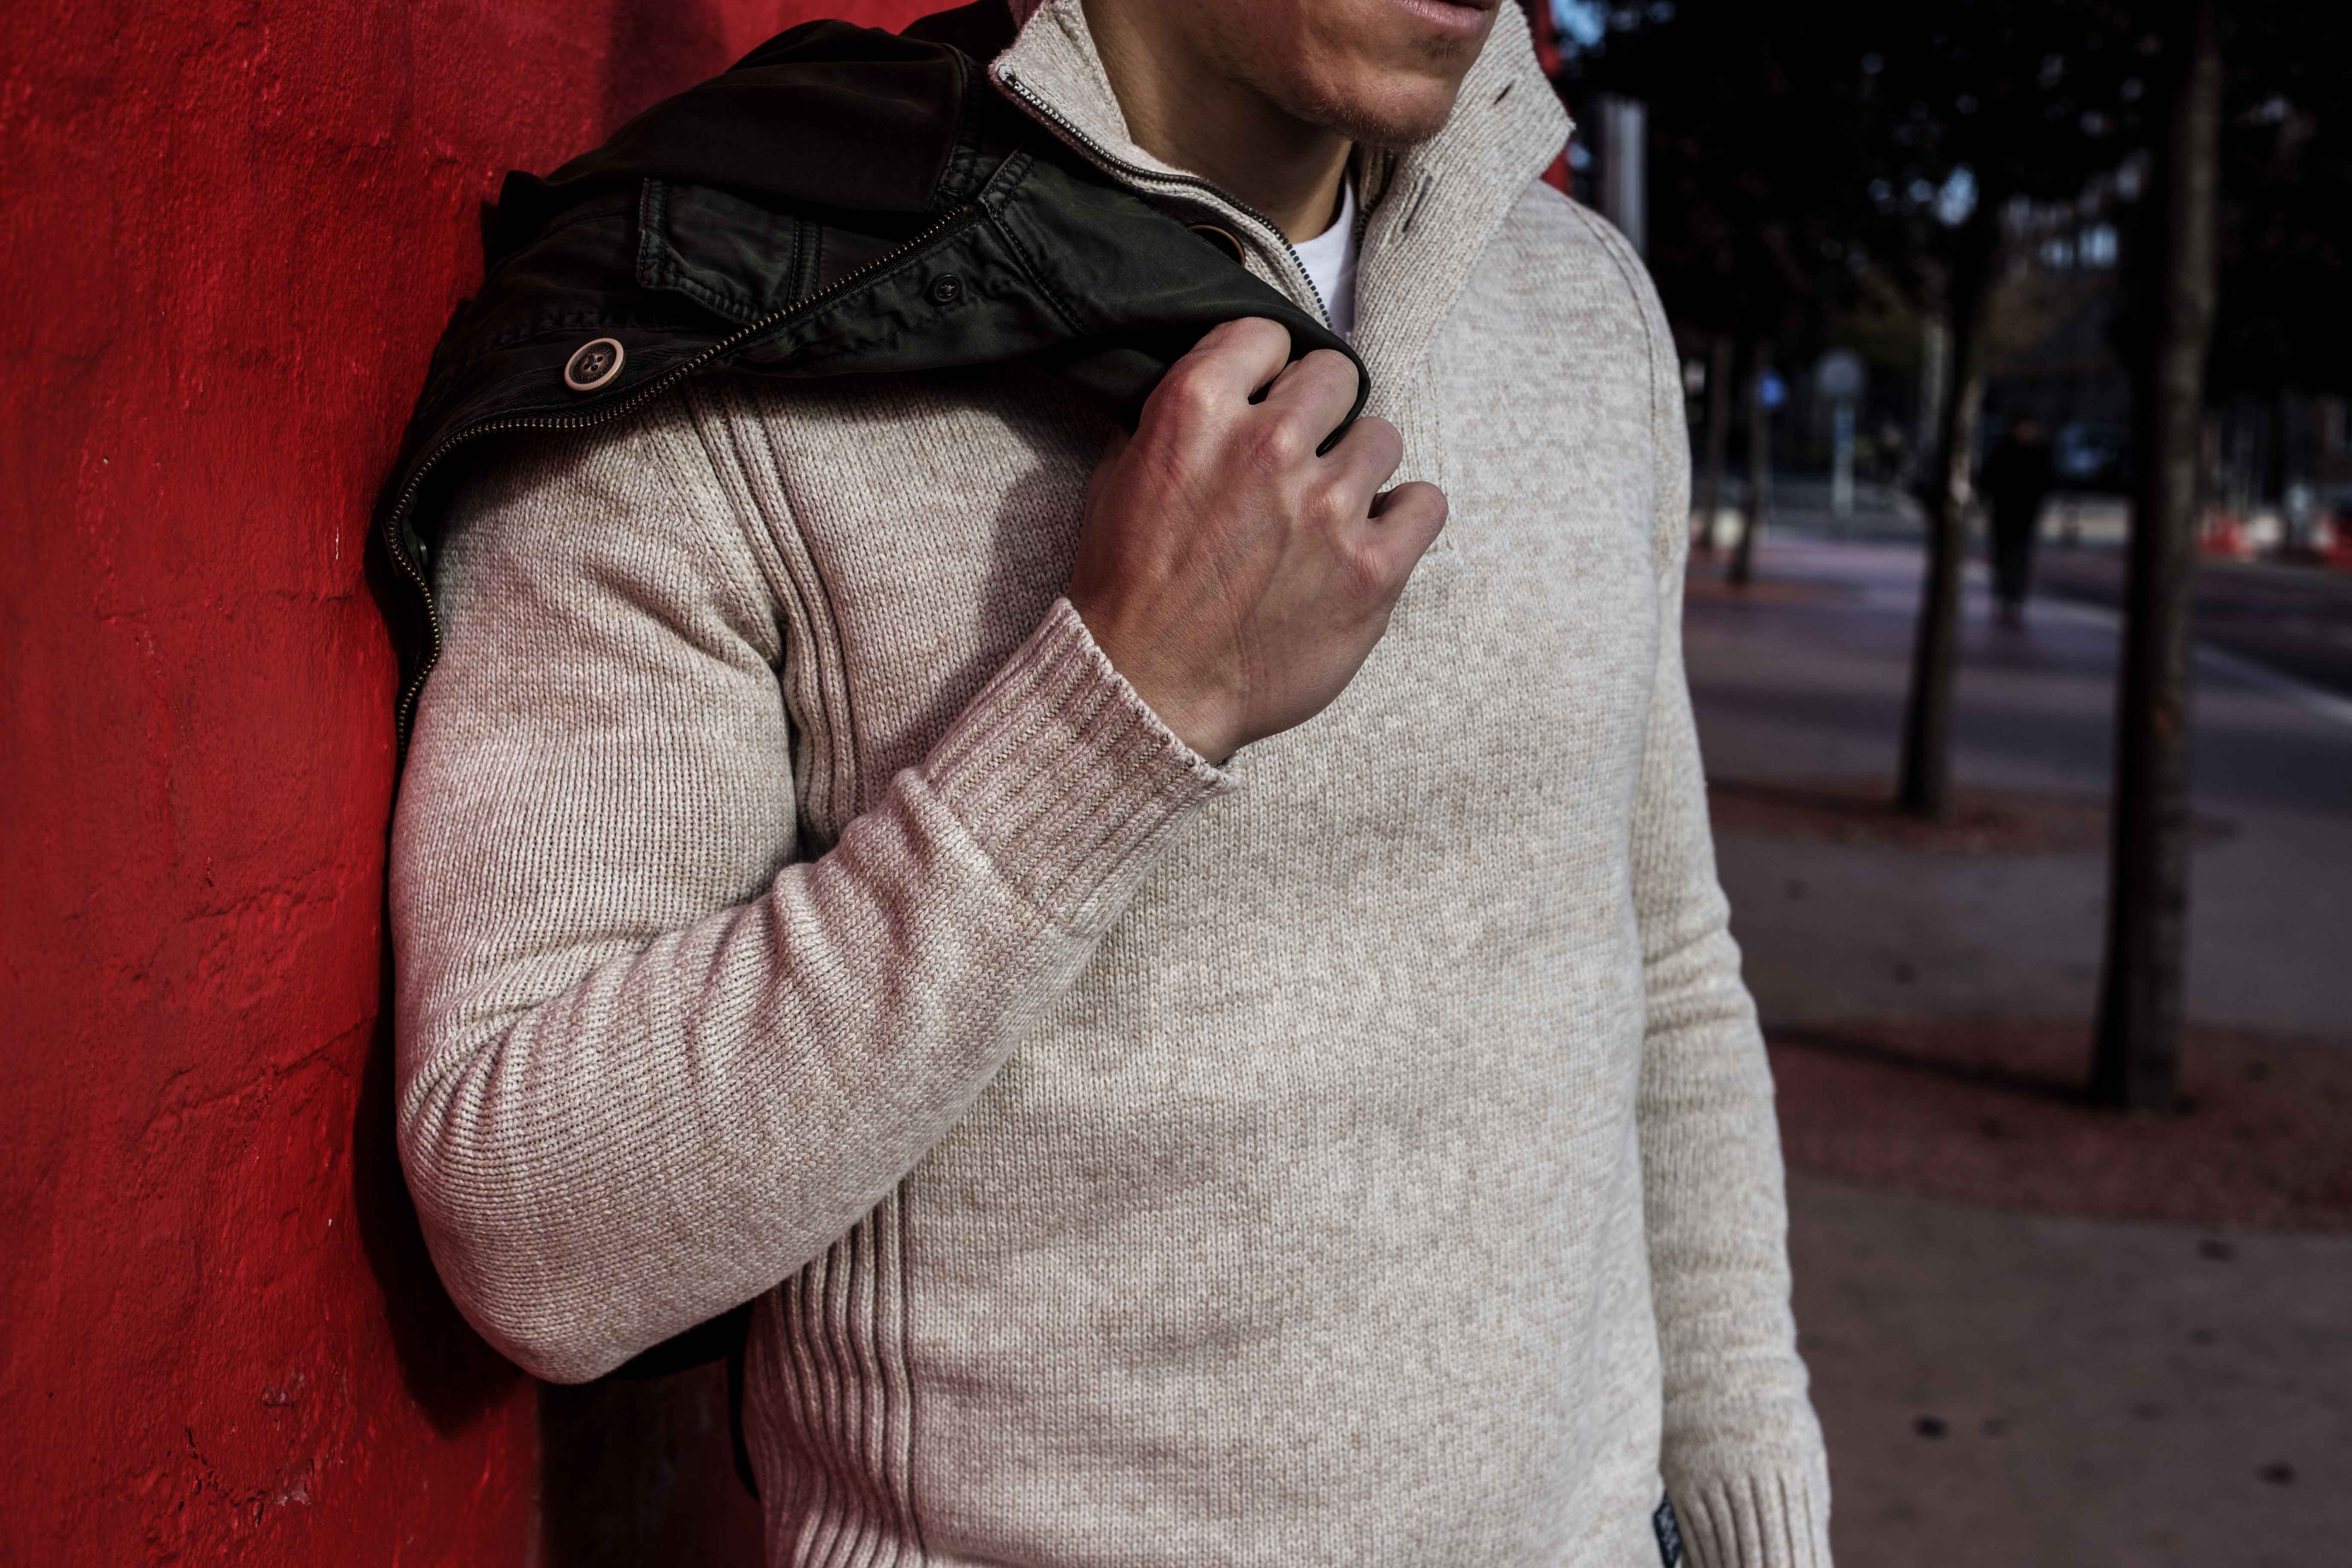 beiger-pullover-aufknoepfbarer-kragen-blaue-jeans-olivgruener-kurzparka-braune-lederstiefel-superkilen-kopenhagen_5713